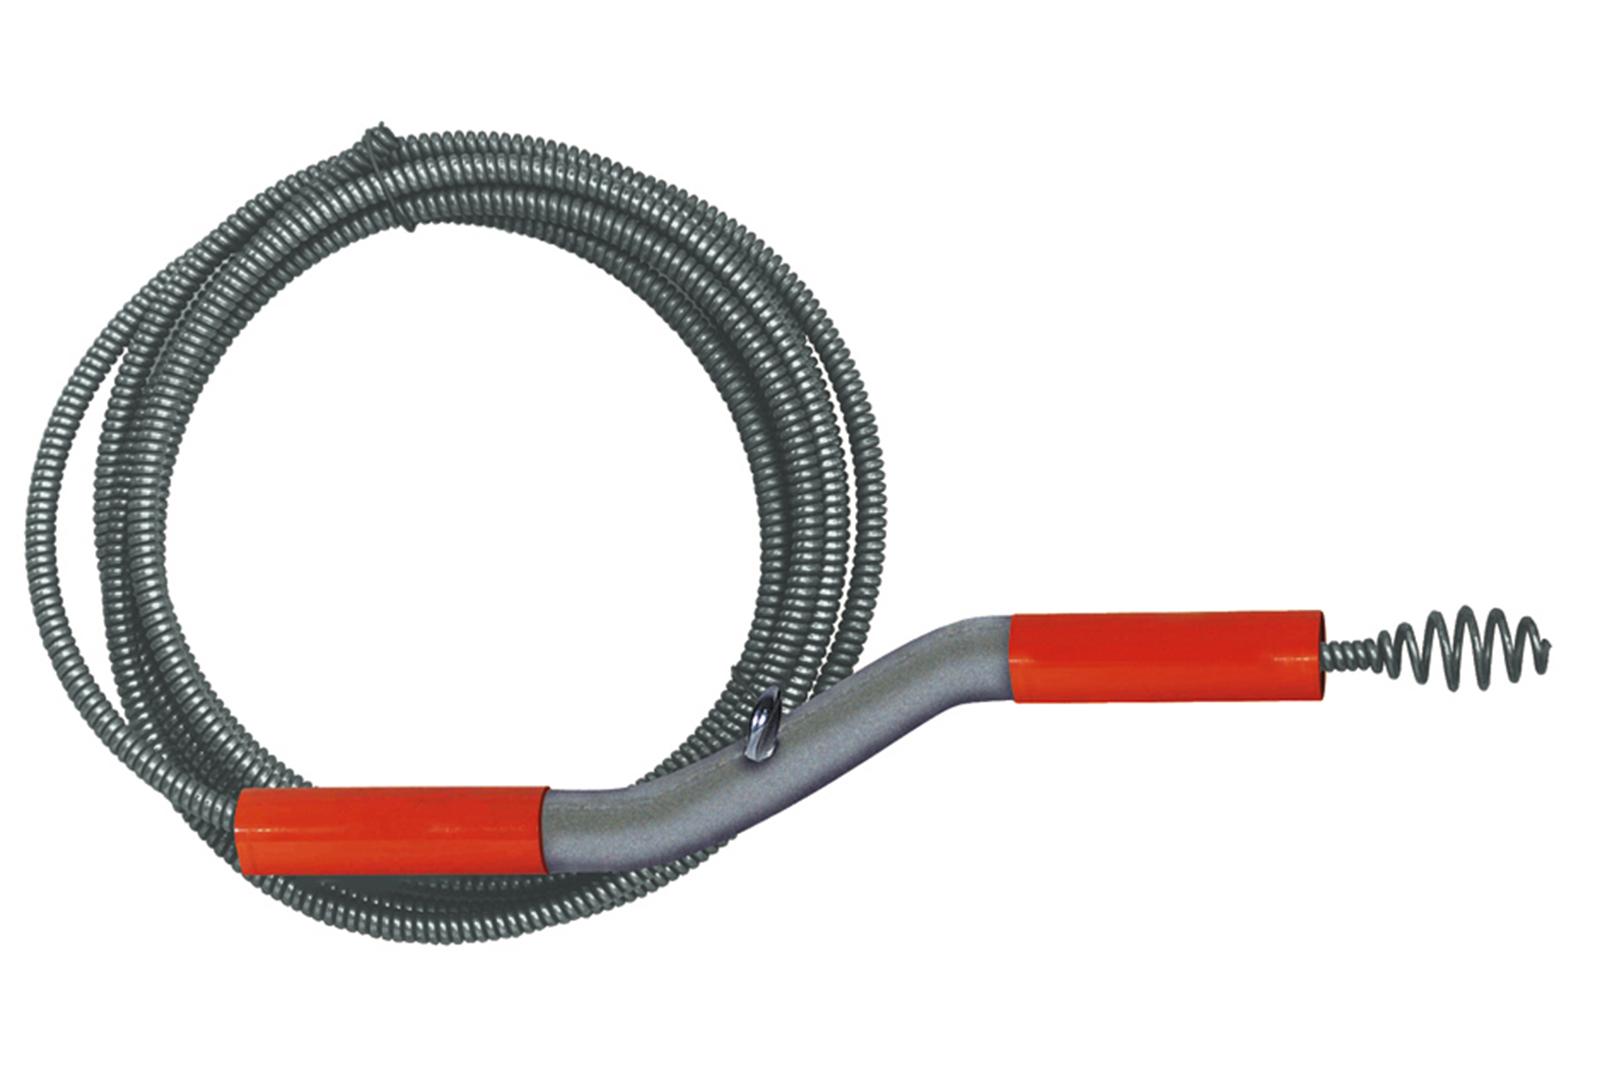 Трос для прочистки General pipe Flexicore 25fl1-a